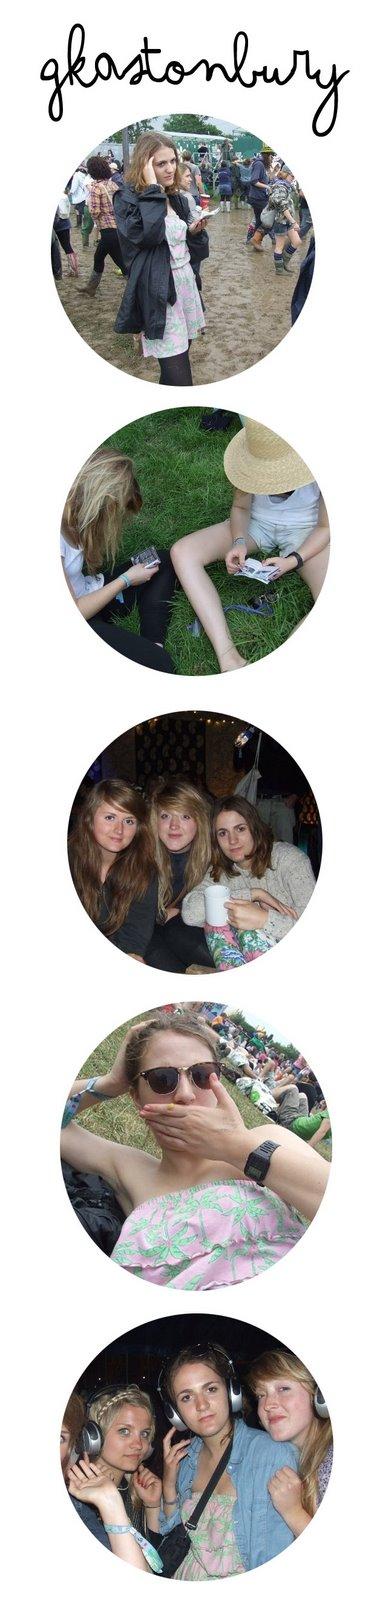 [glastonbury+pics.jpg]